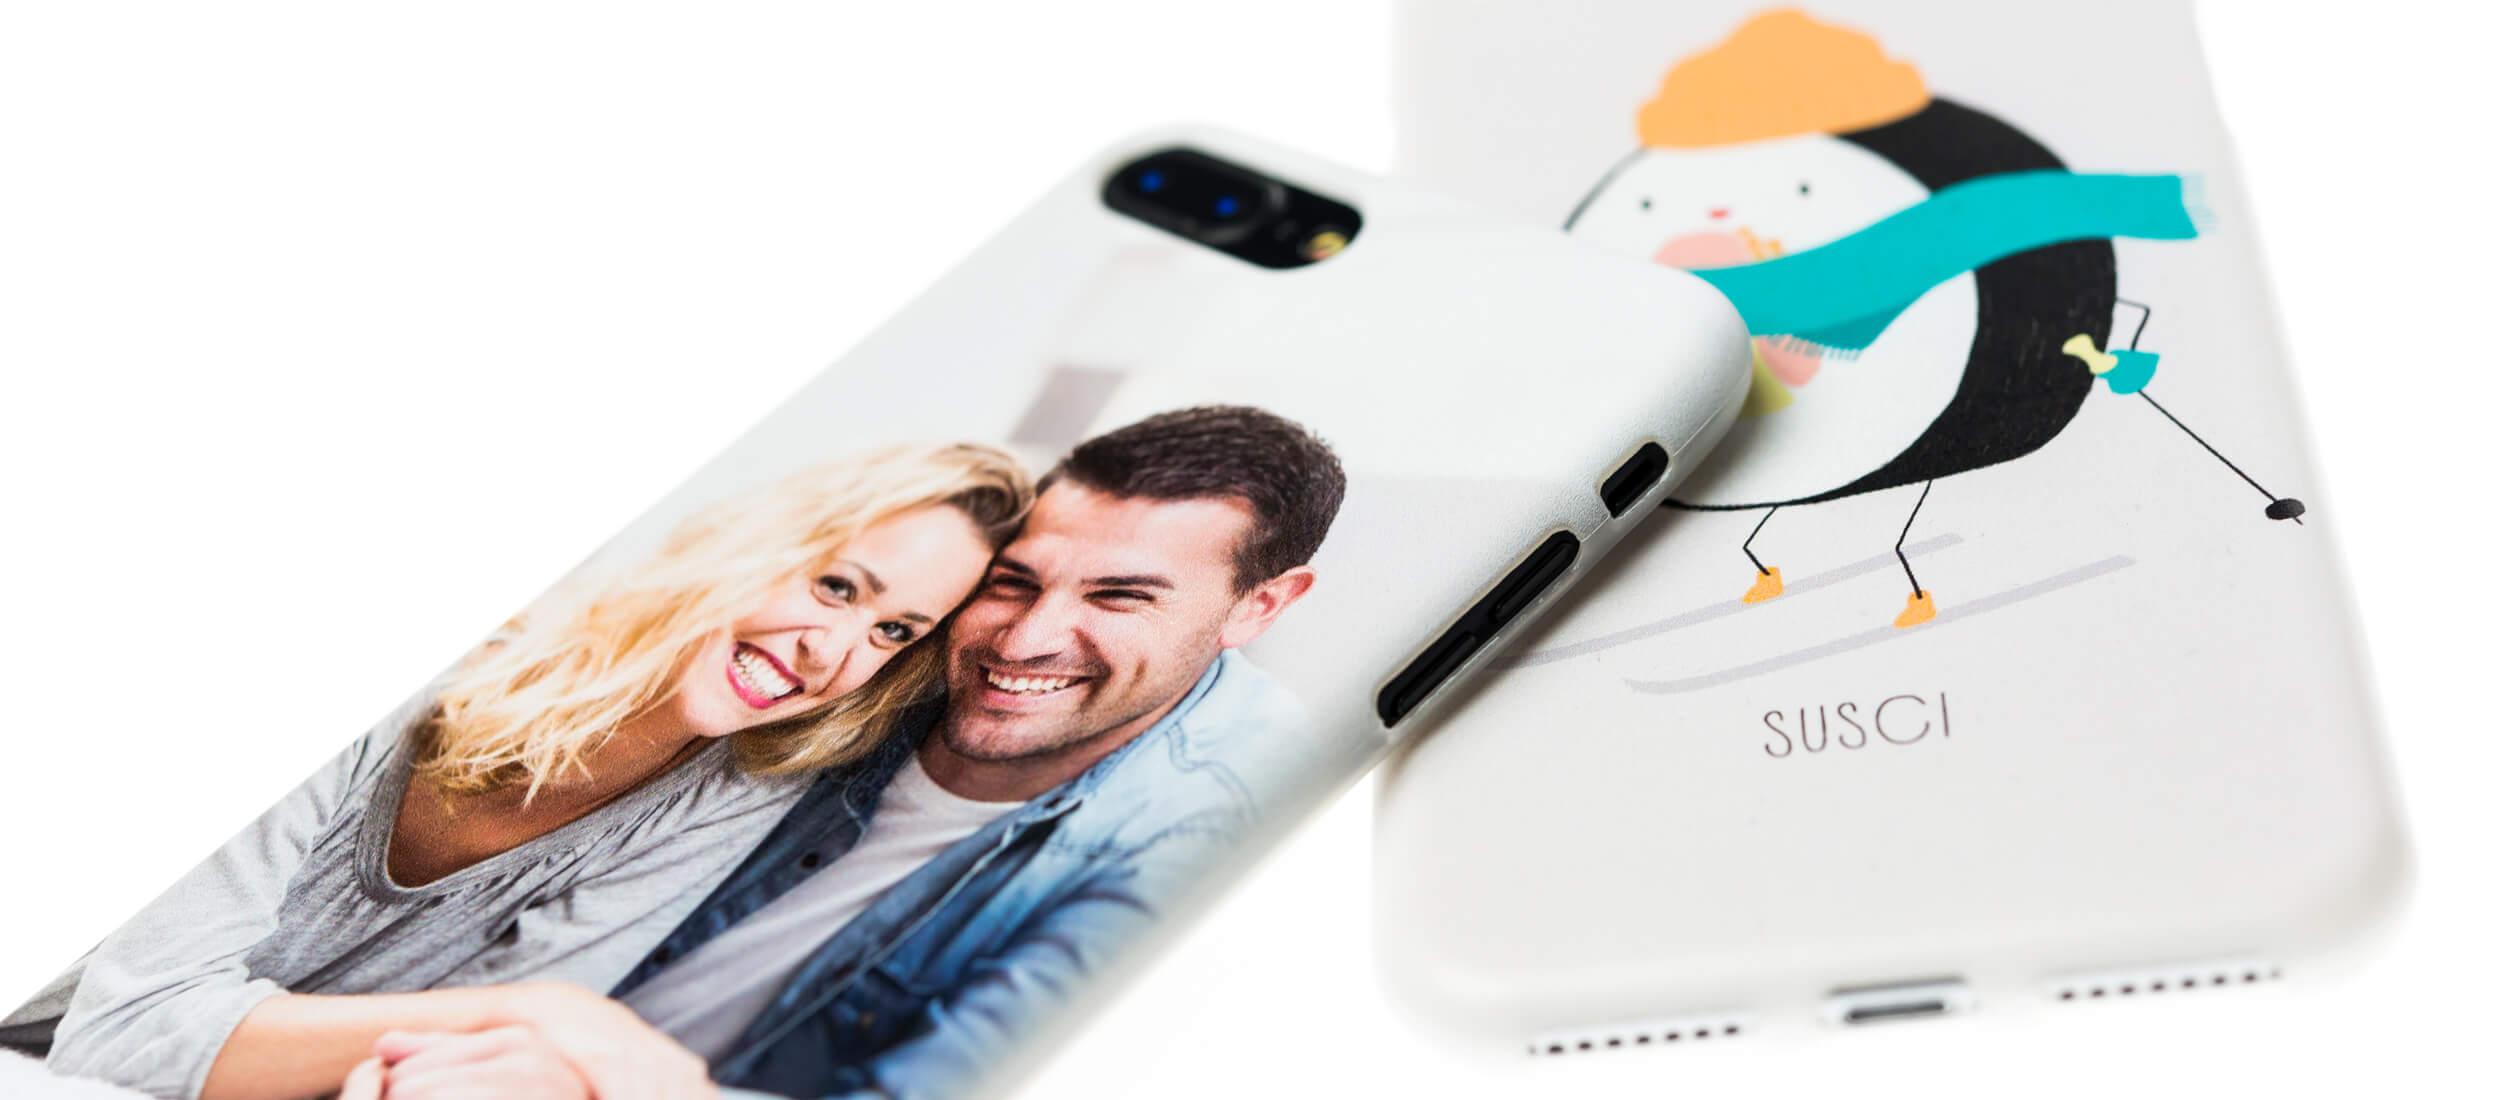 cover-iphone-8-plus-personalizzate_04